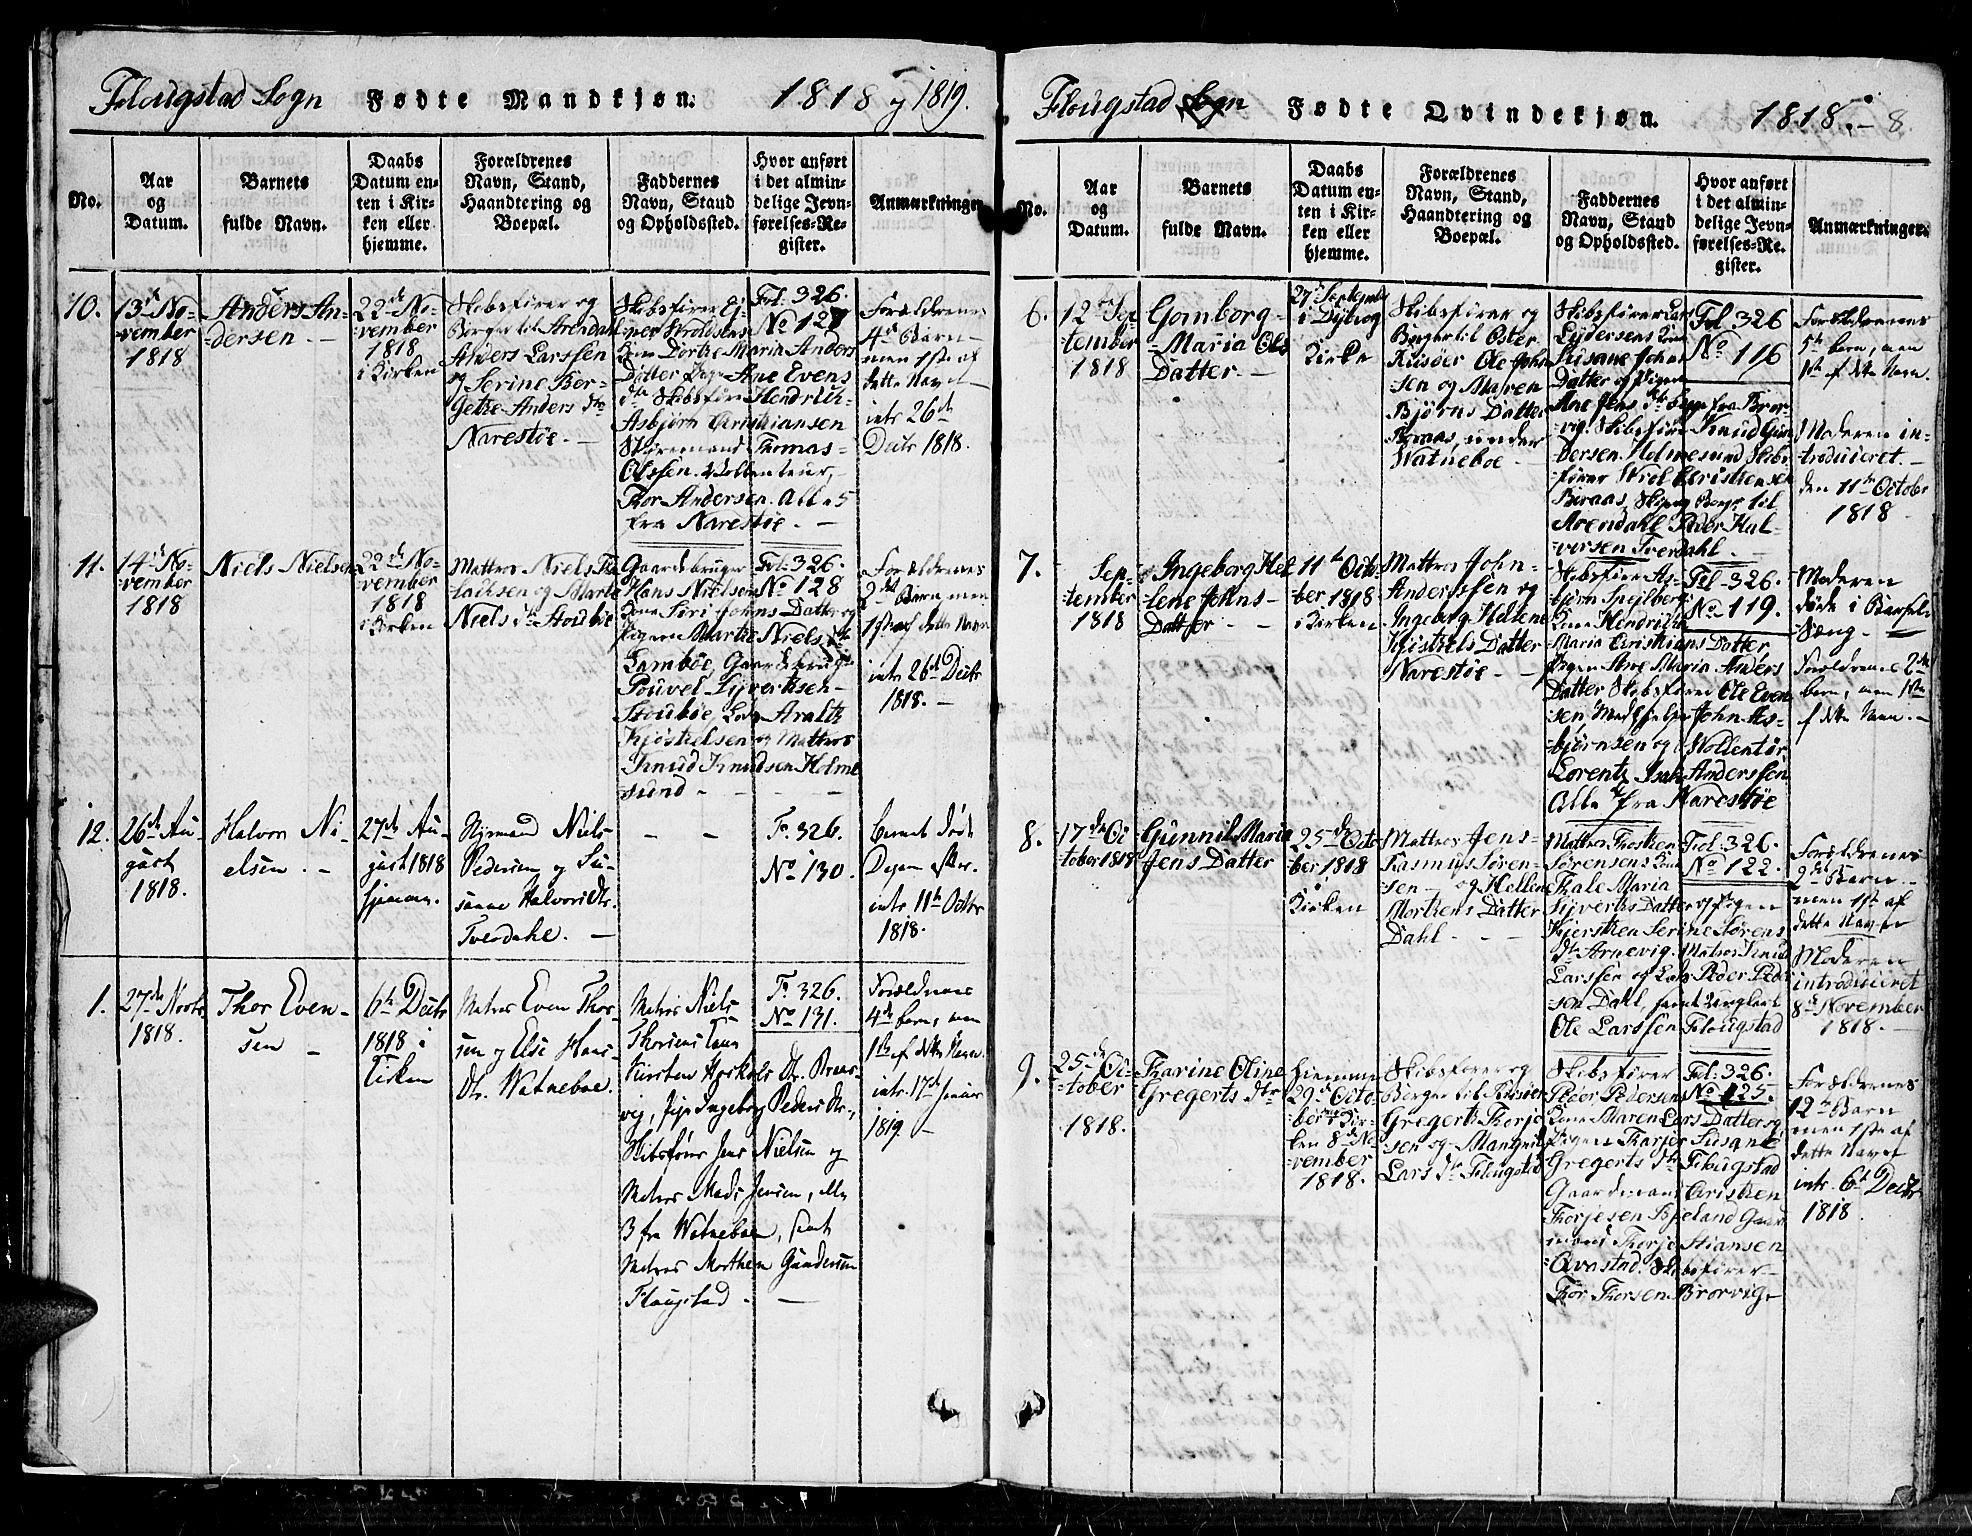 SAK, Dypvåg sokneprestkontor, F/Fb/Fbb/L0001: Klokkerbok nr. B 1, 1816-1850, s. 8